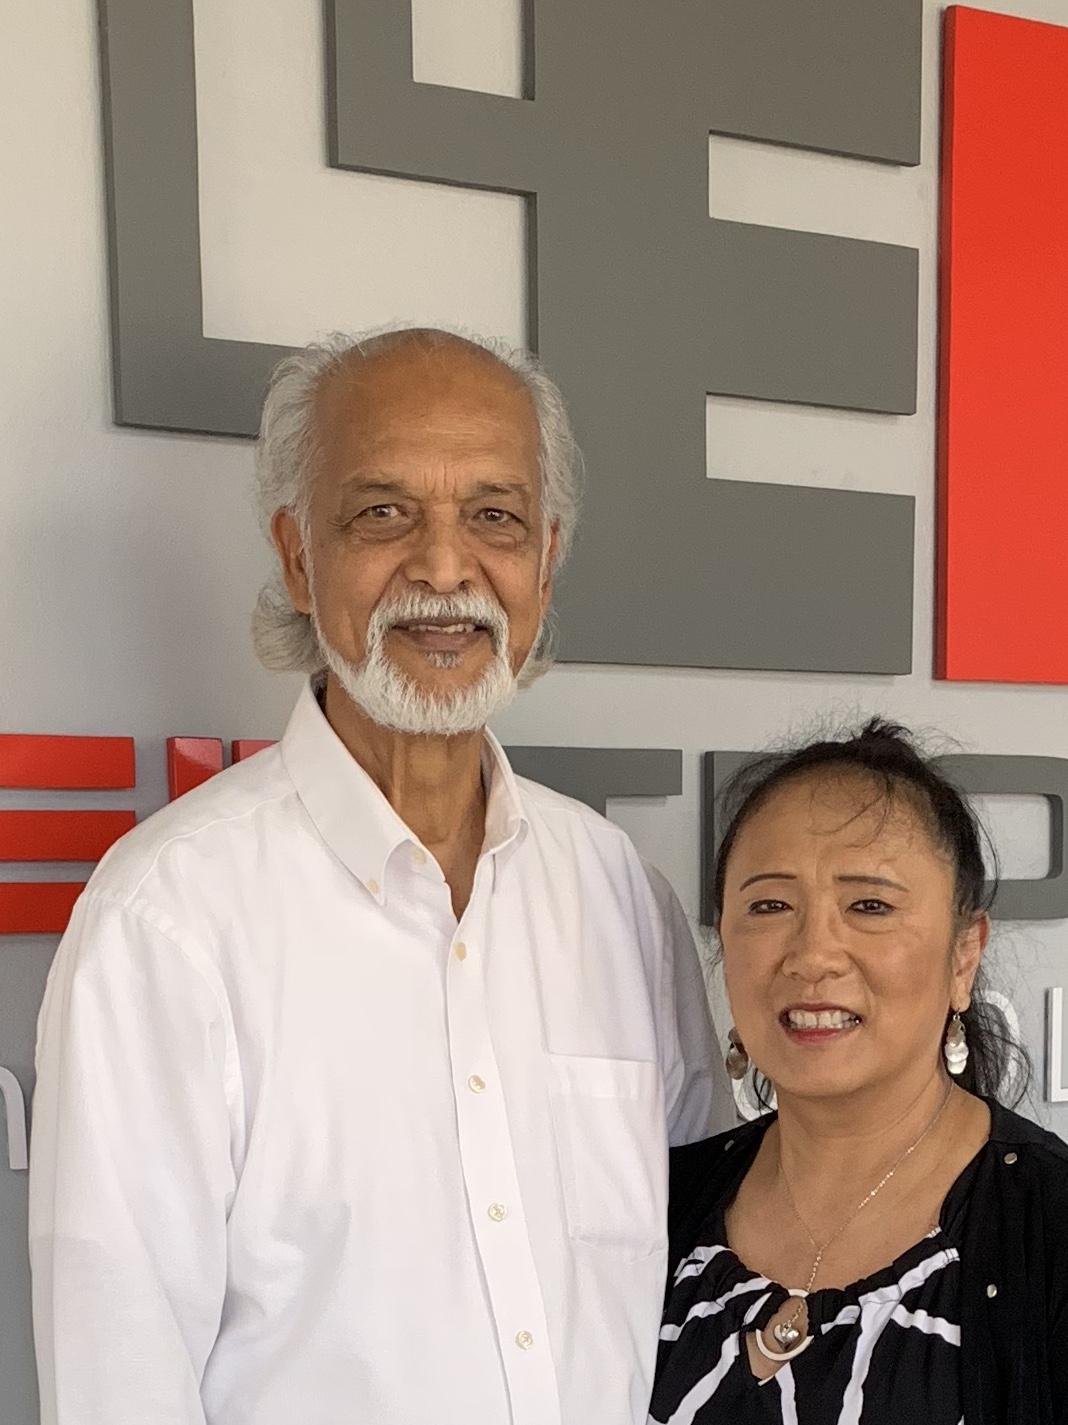 Arlyn and client CFO Ramlogan